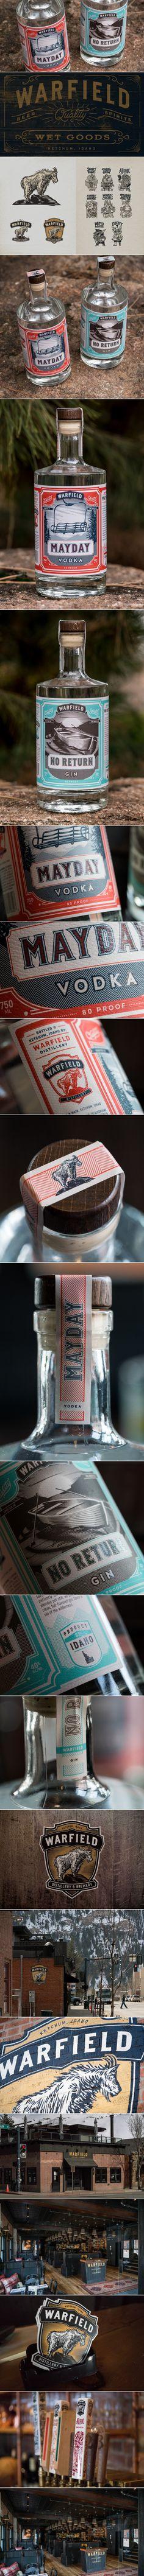 Warfield Distillery & Brewery — The Dieline | Packaging & Branding Design & Innovation News